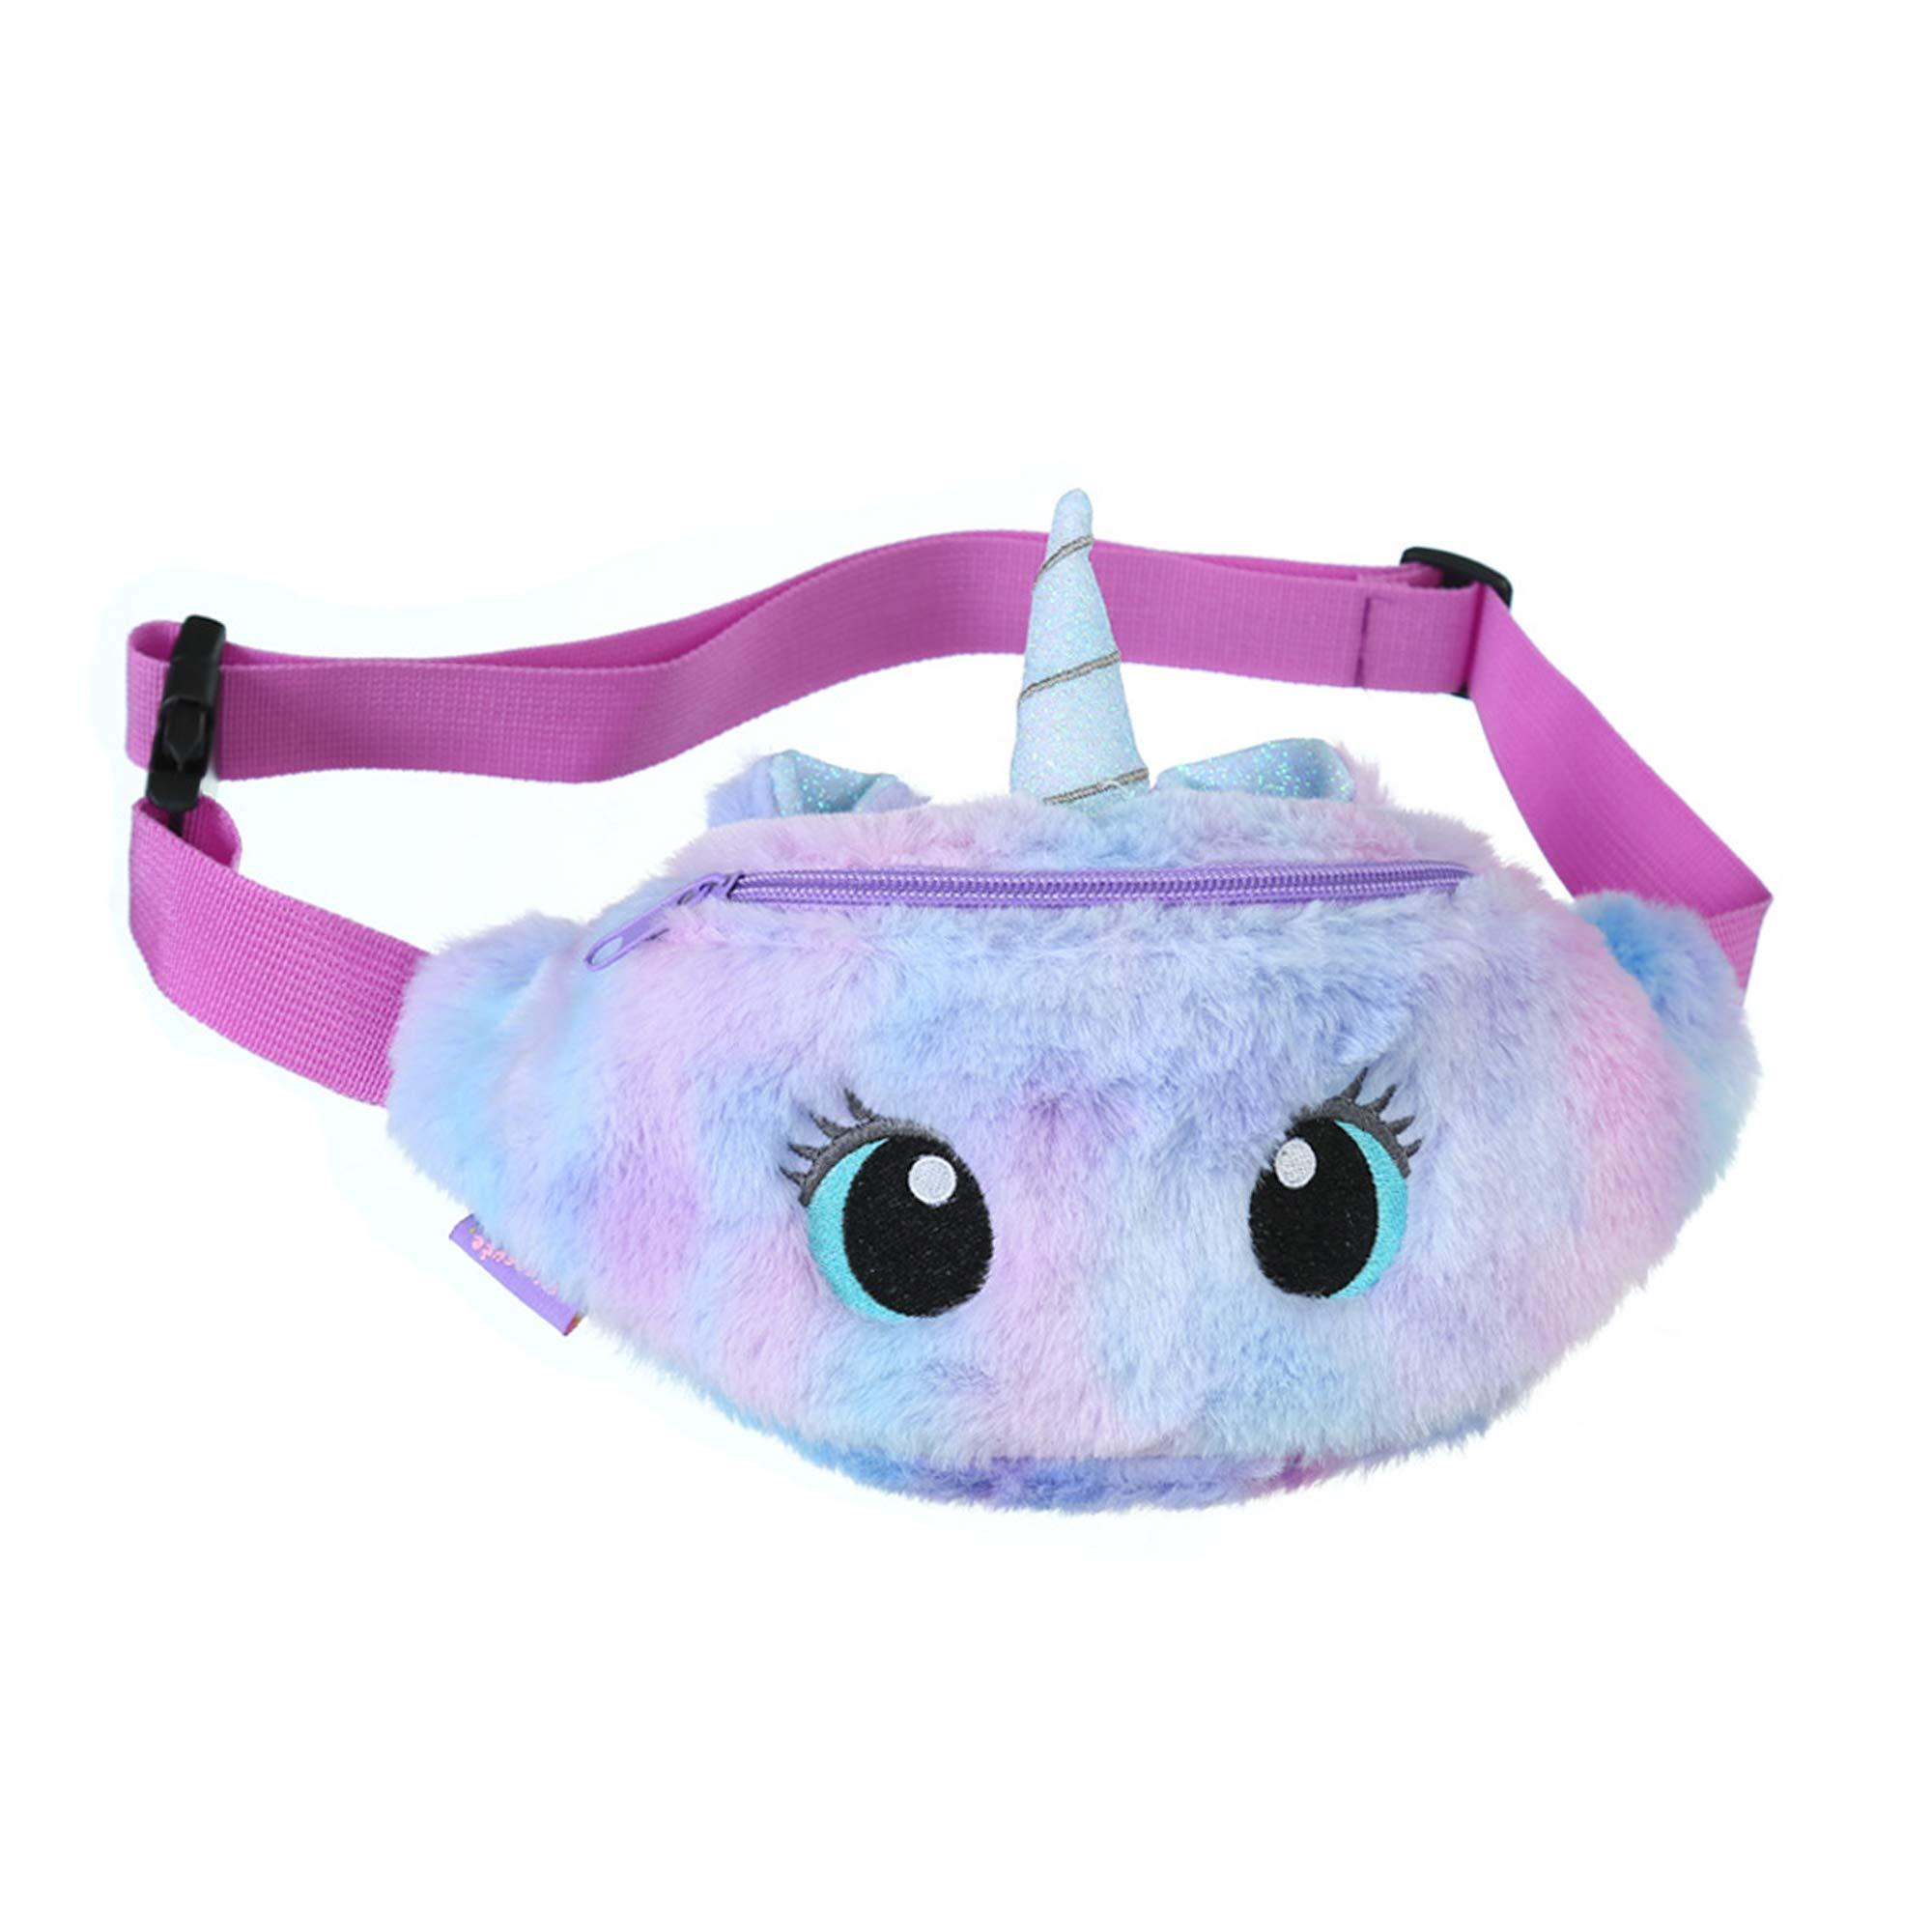 YuDanae Rainbow Unicorn Plush Fuzzy Fanny Pack Waist Bag Cute Bum Bag for Kids Girls(Big Eye Purple)